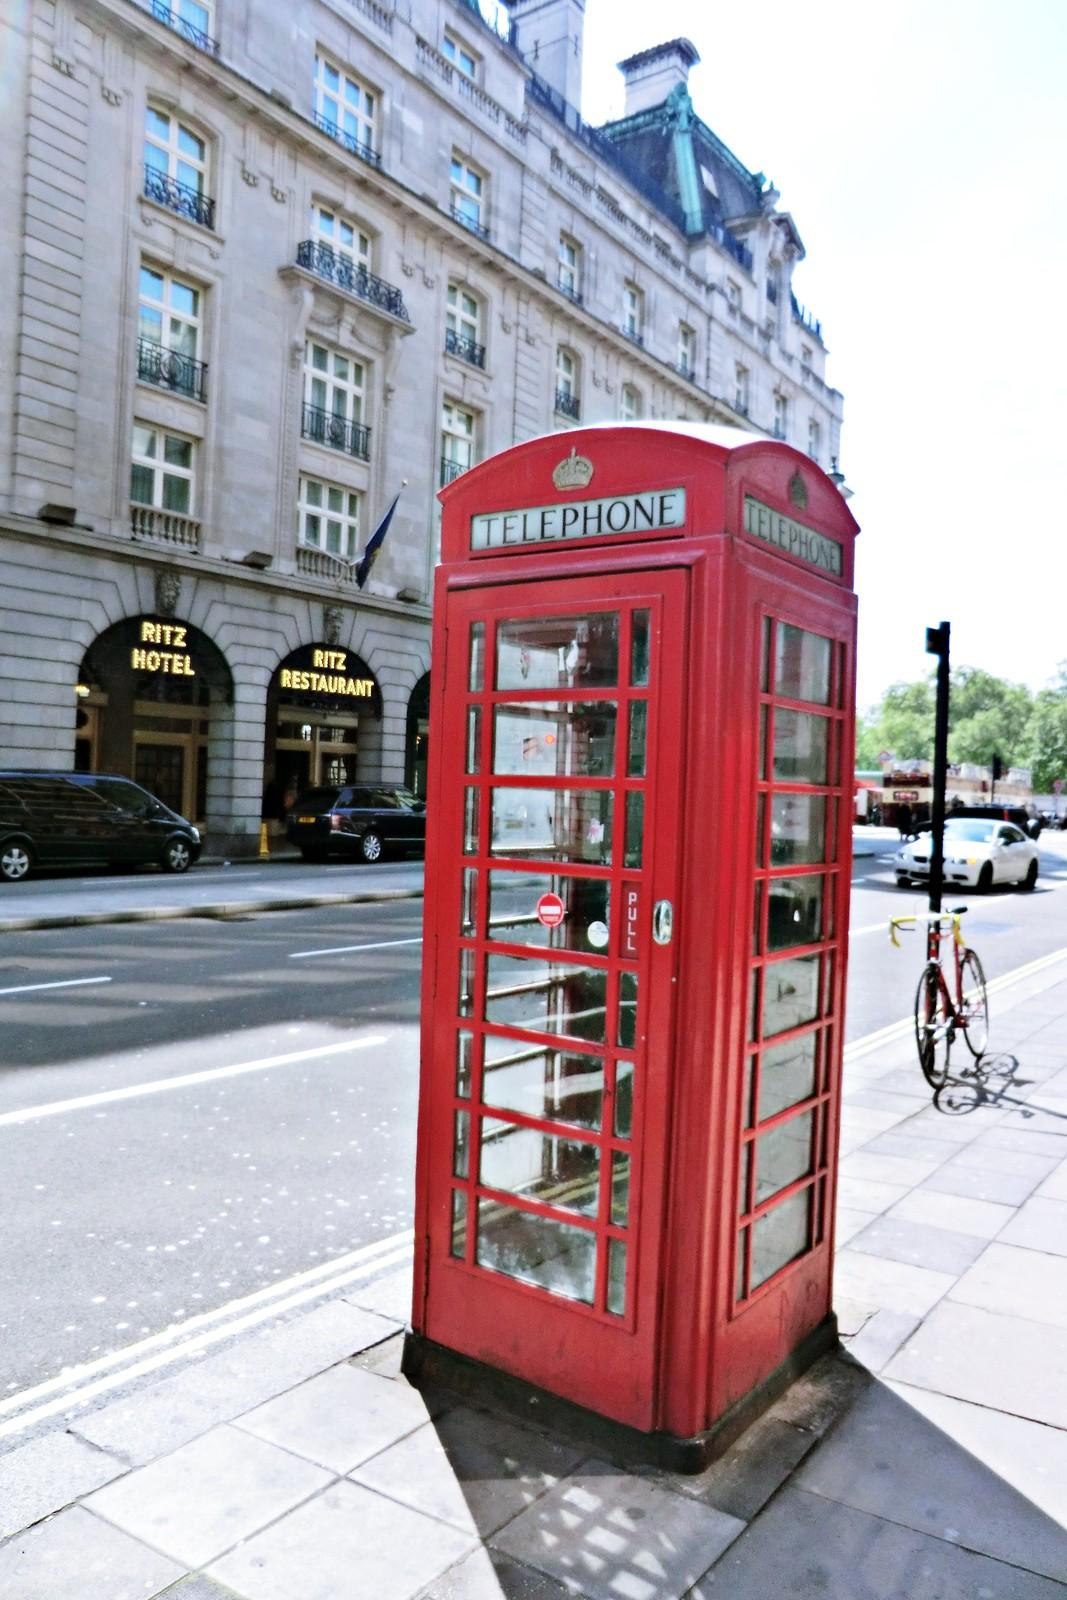 Telephone Box up Picadilly road